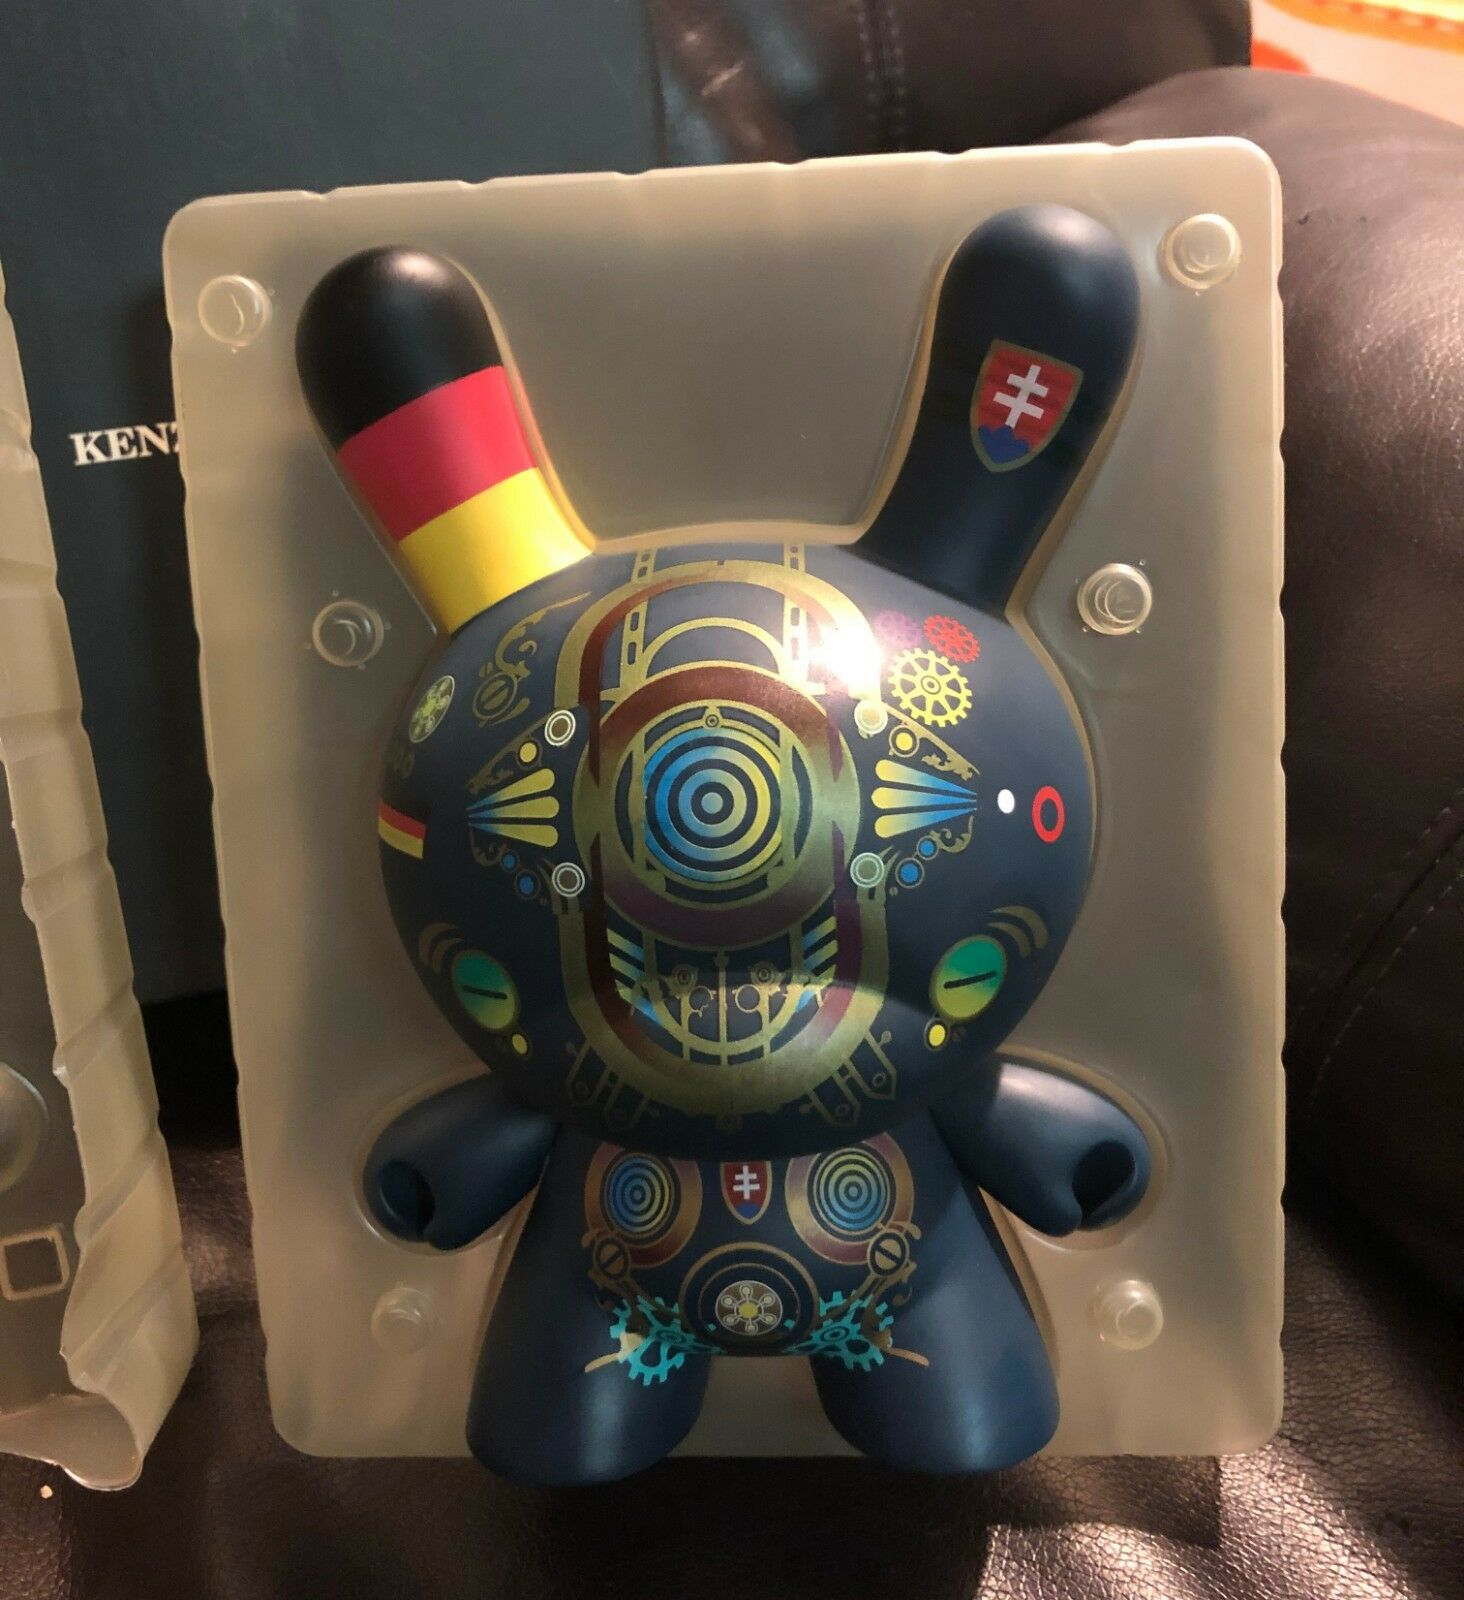 Kenzo Minami 8  Dunny kidrobot message board release Japan art figure toy RARE